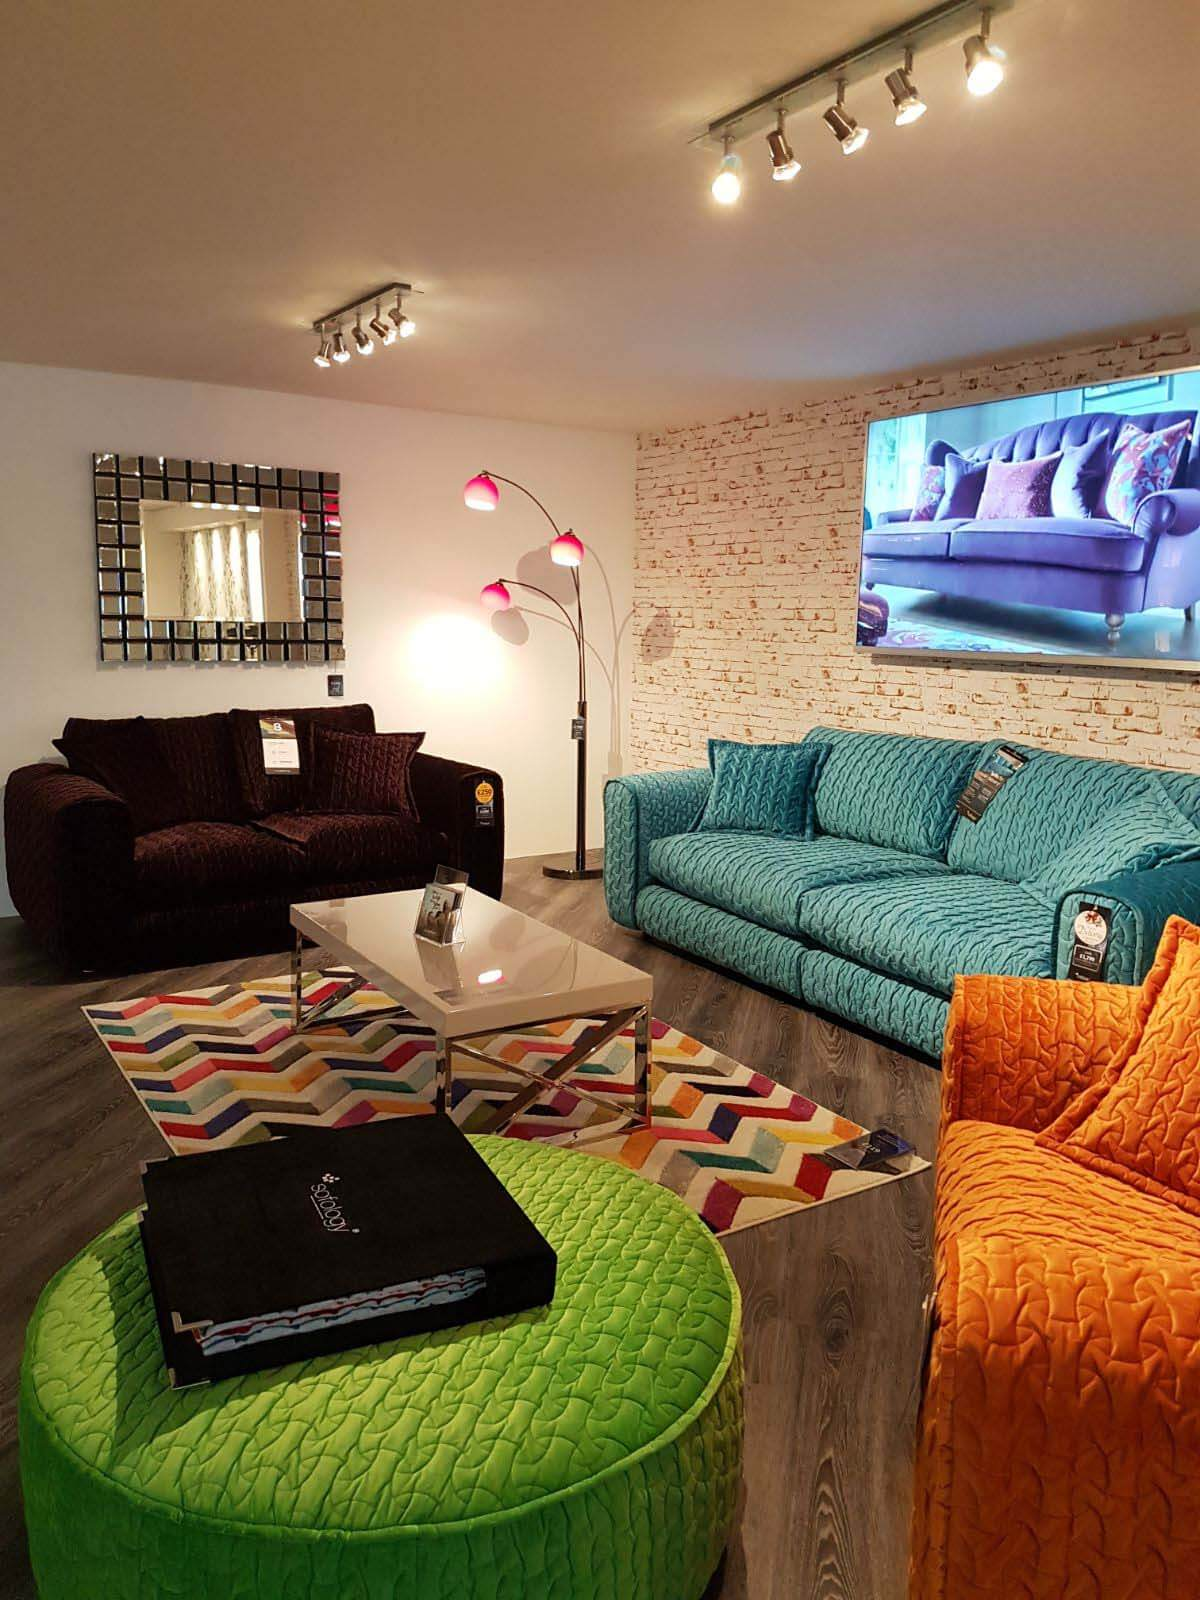 Sofa So Good with Sofology - the Candi Range